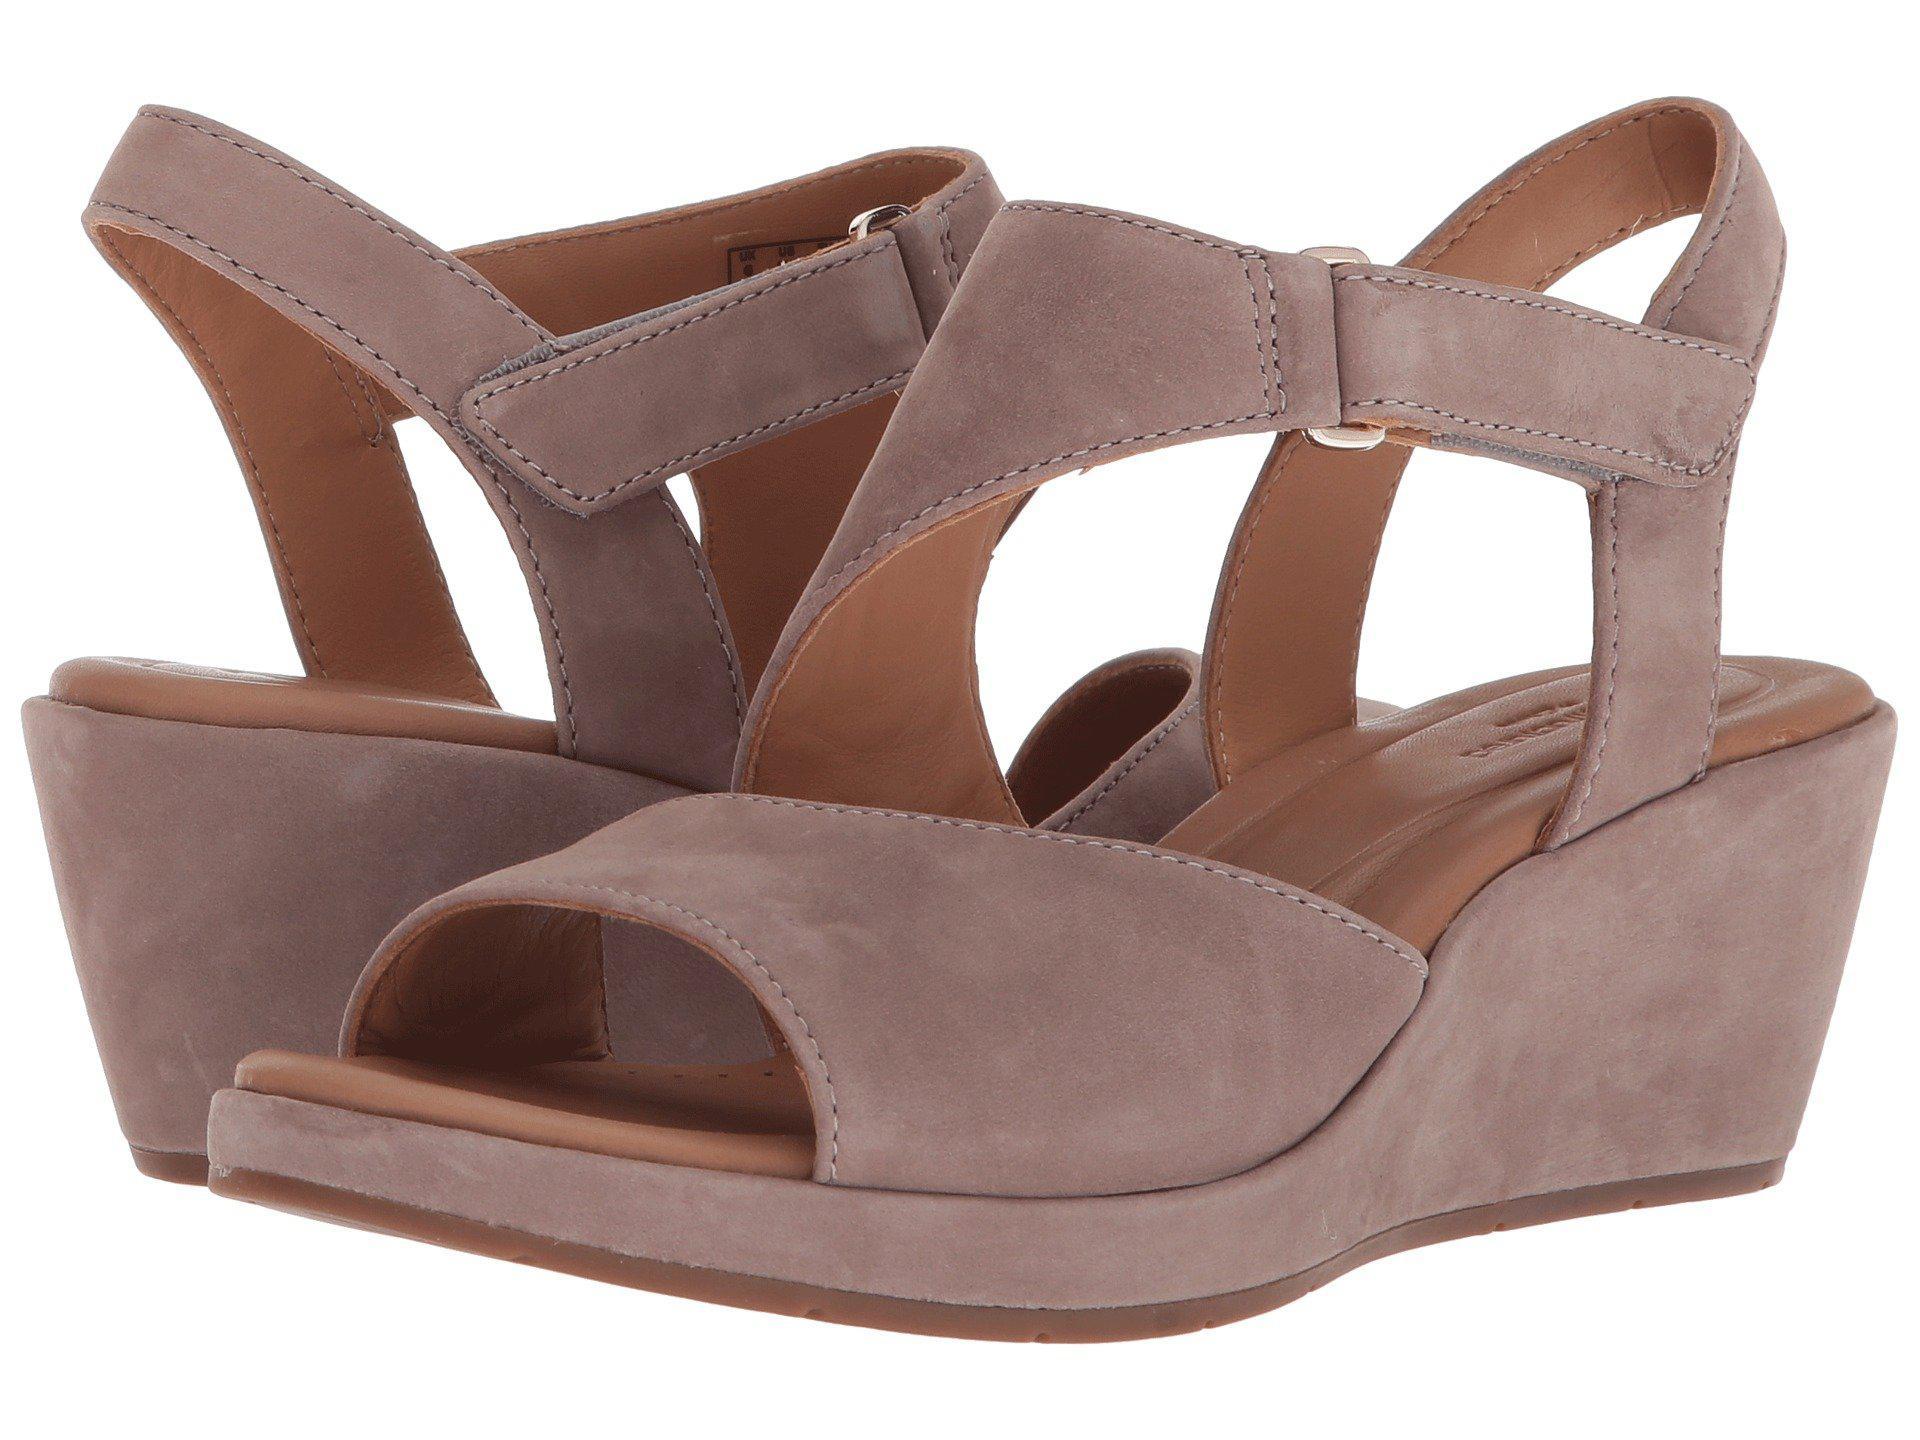 d2e9ead531c Lyst - Clarks Un Plaza Sling (black Nubuck) Women s Wedge Shoes in Brown